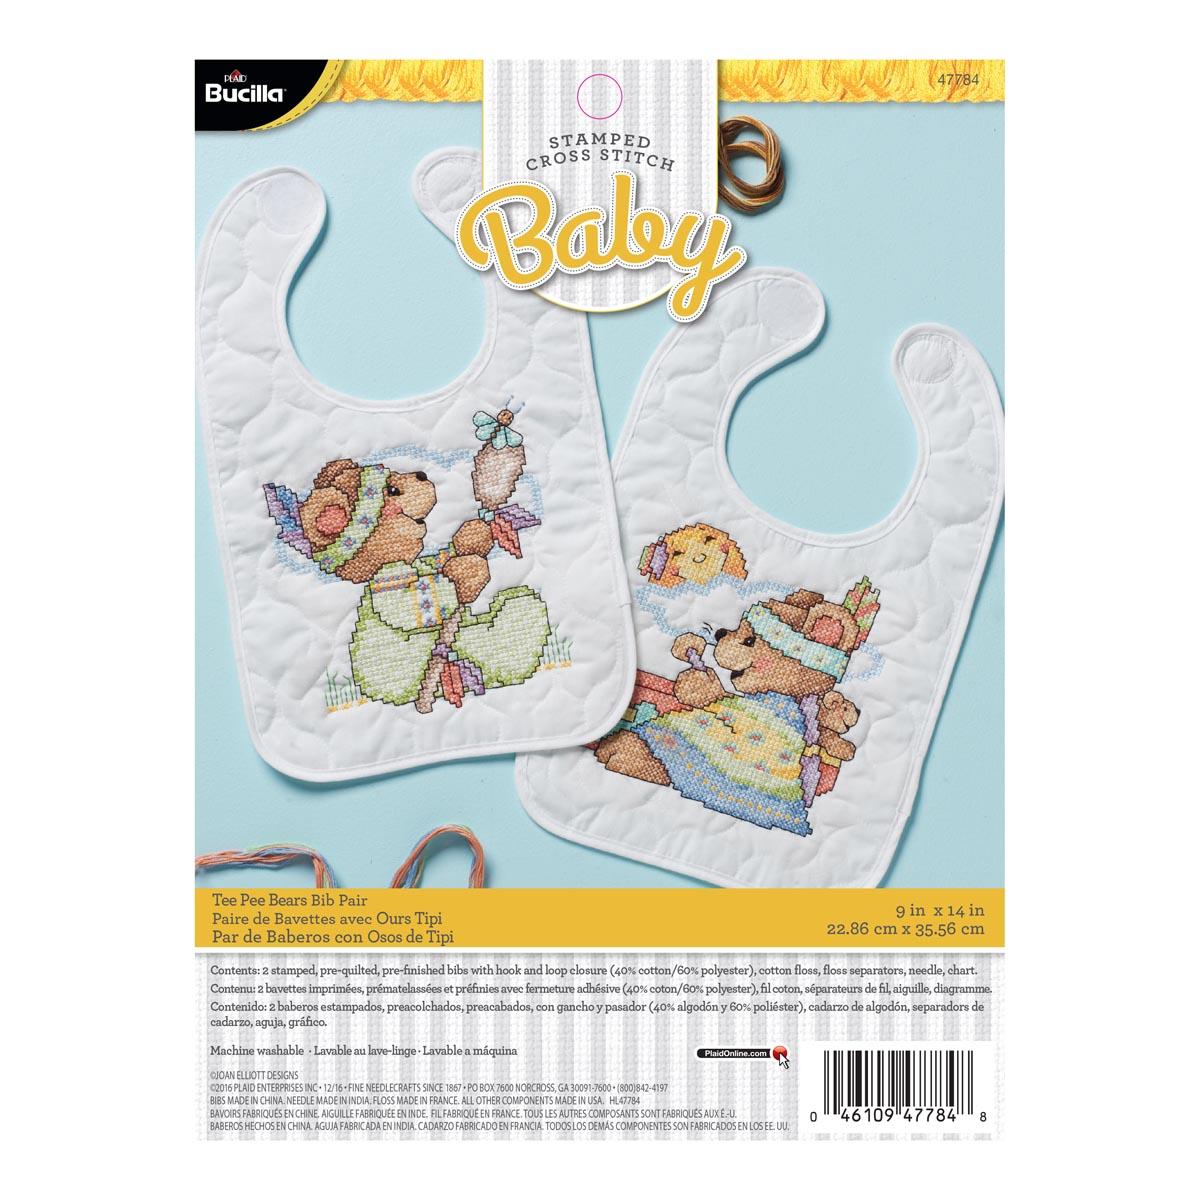 Bucilla ® Baby - Stamped Cross Stitch - Crib Ensembles - Tee Pee Bears Bib Pair Kit - 47784